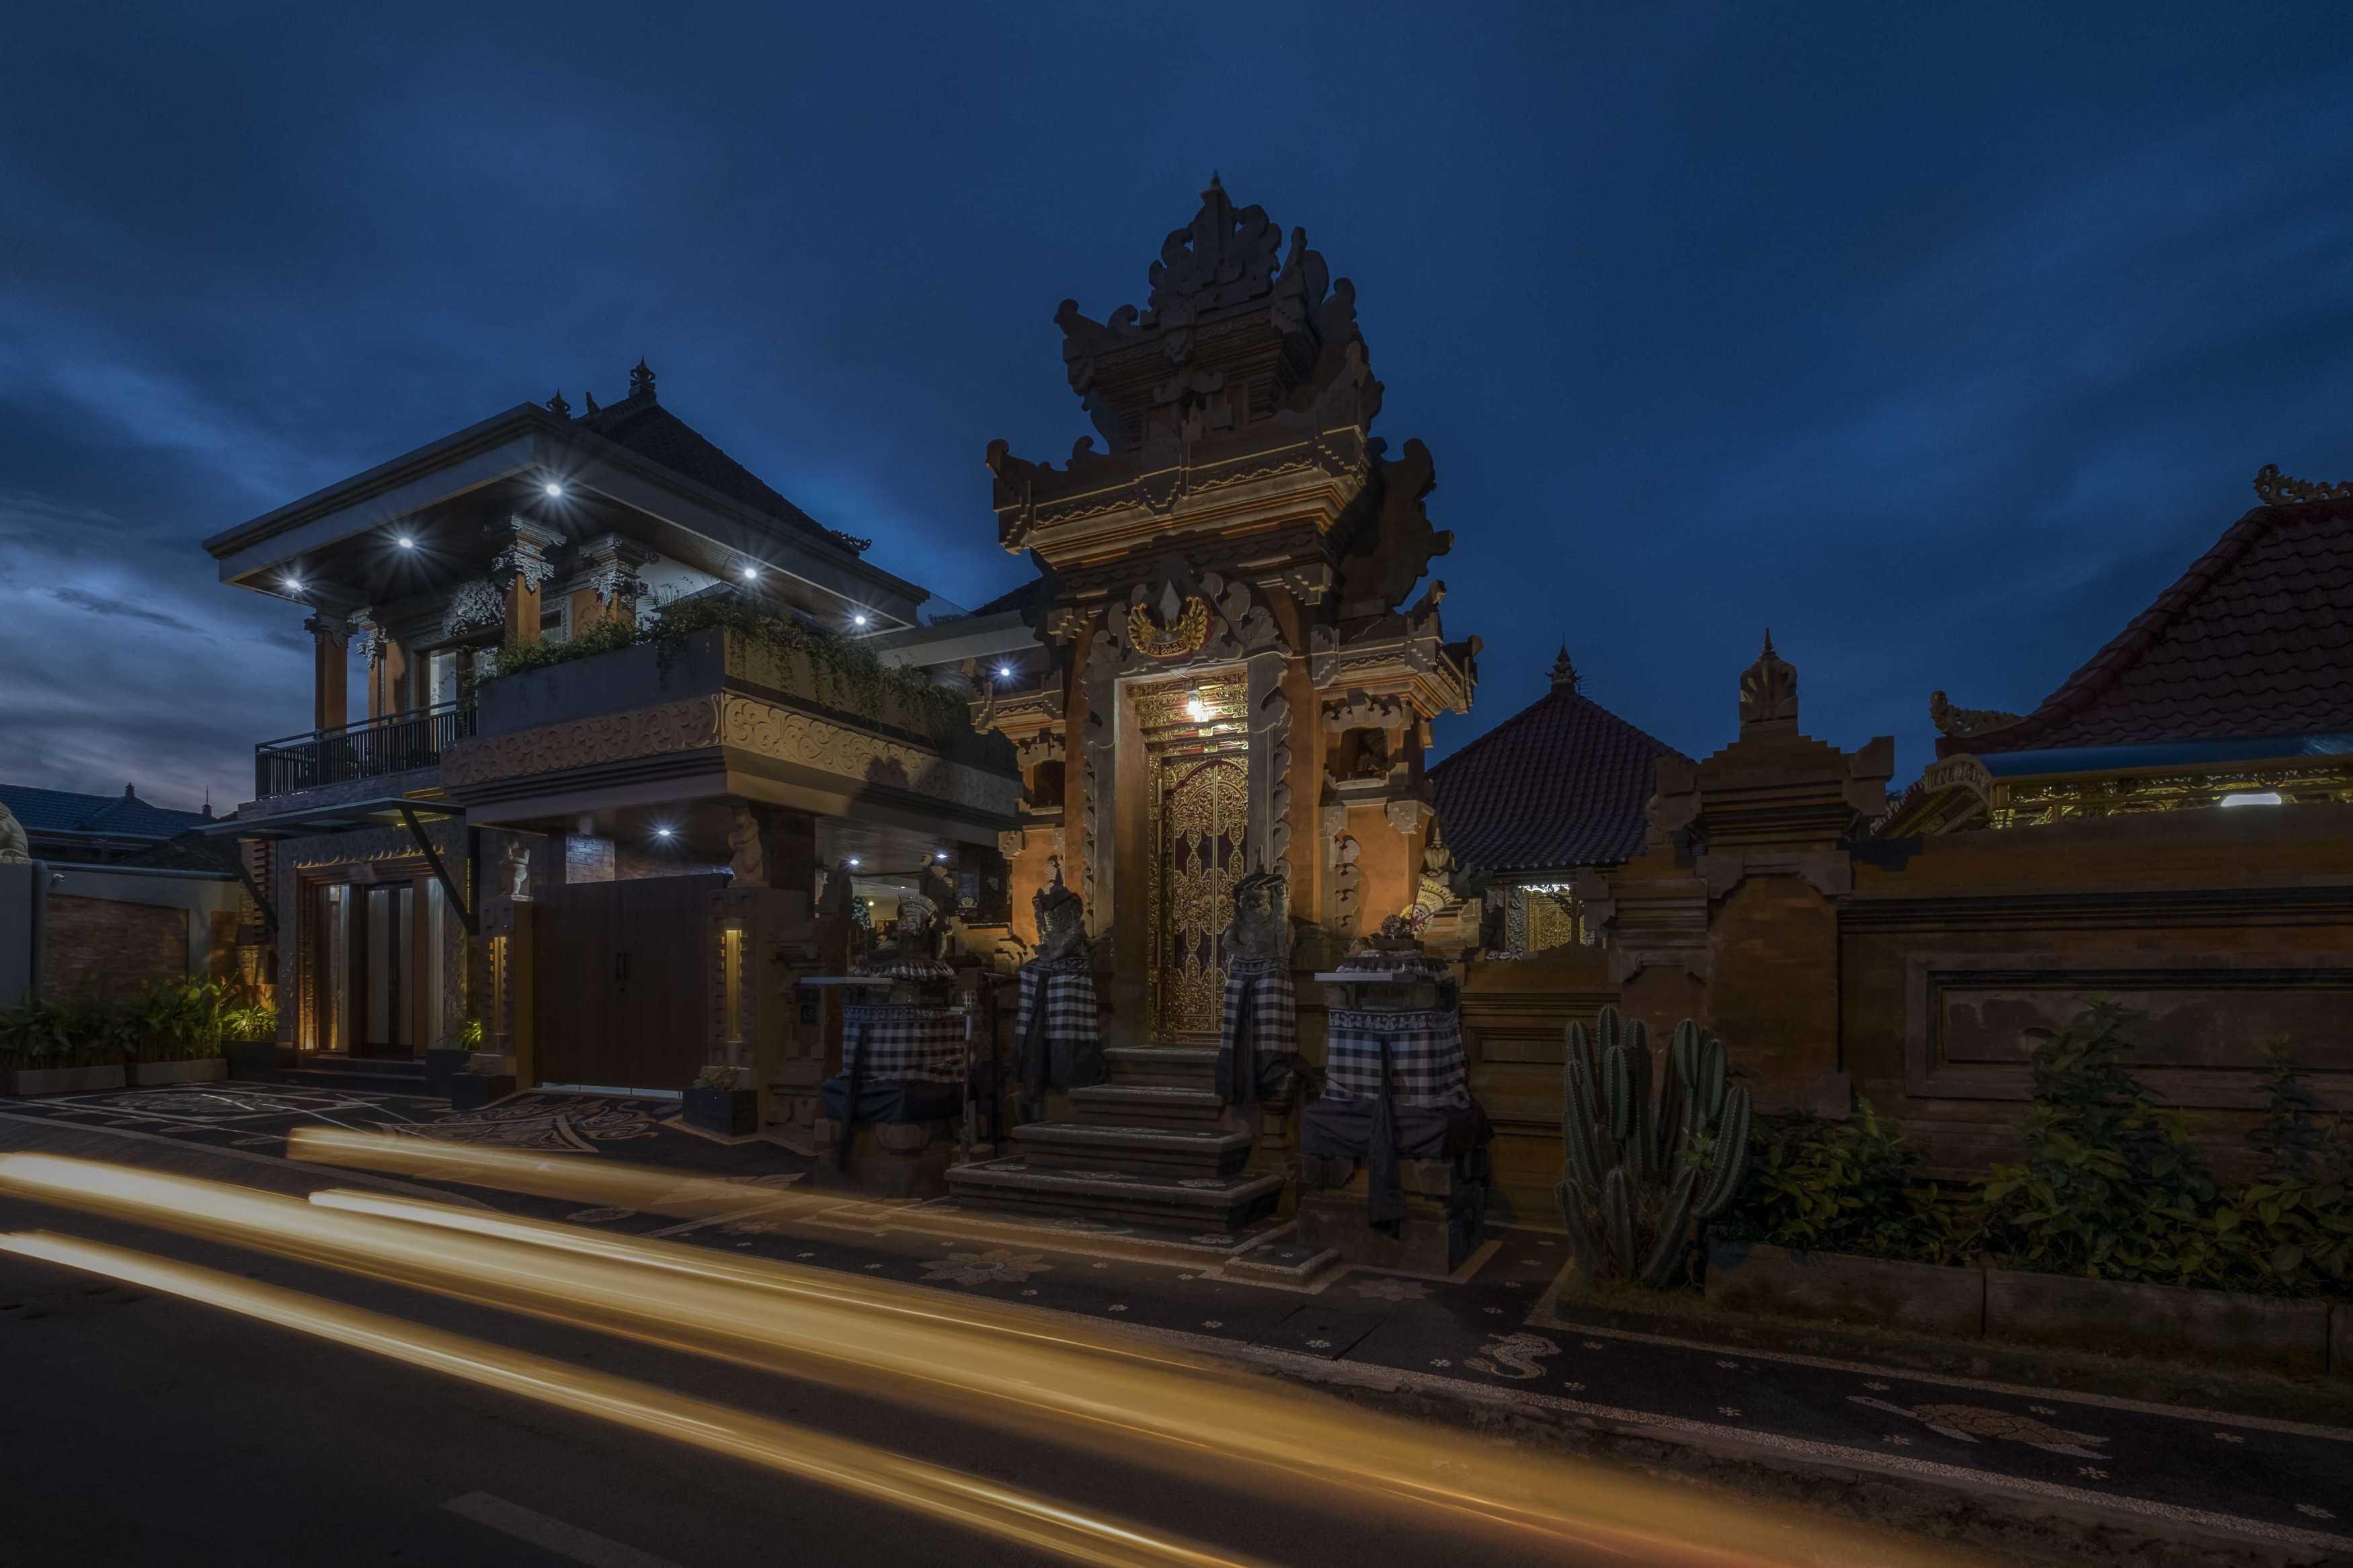 Manon Design Studio Puri Kds Tanjung Benoa Tj. Benoa, Kuta Sel., Kabupaten Badung, Bali, Indonesia Tj. Benoa, Kuta Sel., Kabupaten Badung, Bali, Indonesia Srya3679-Light-Tail Contemporary  38691